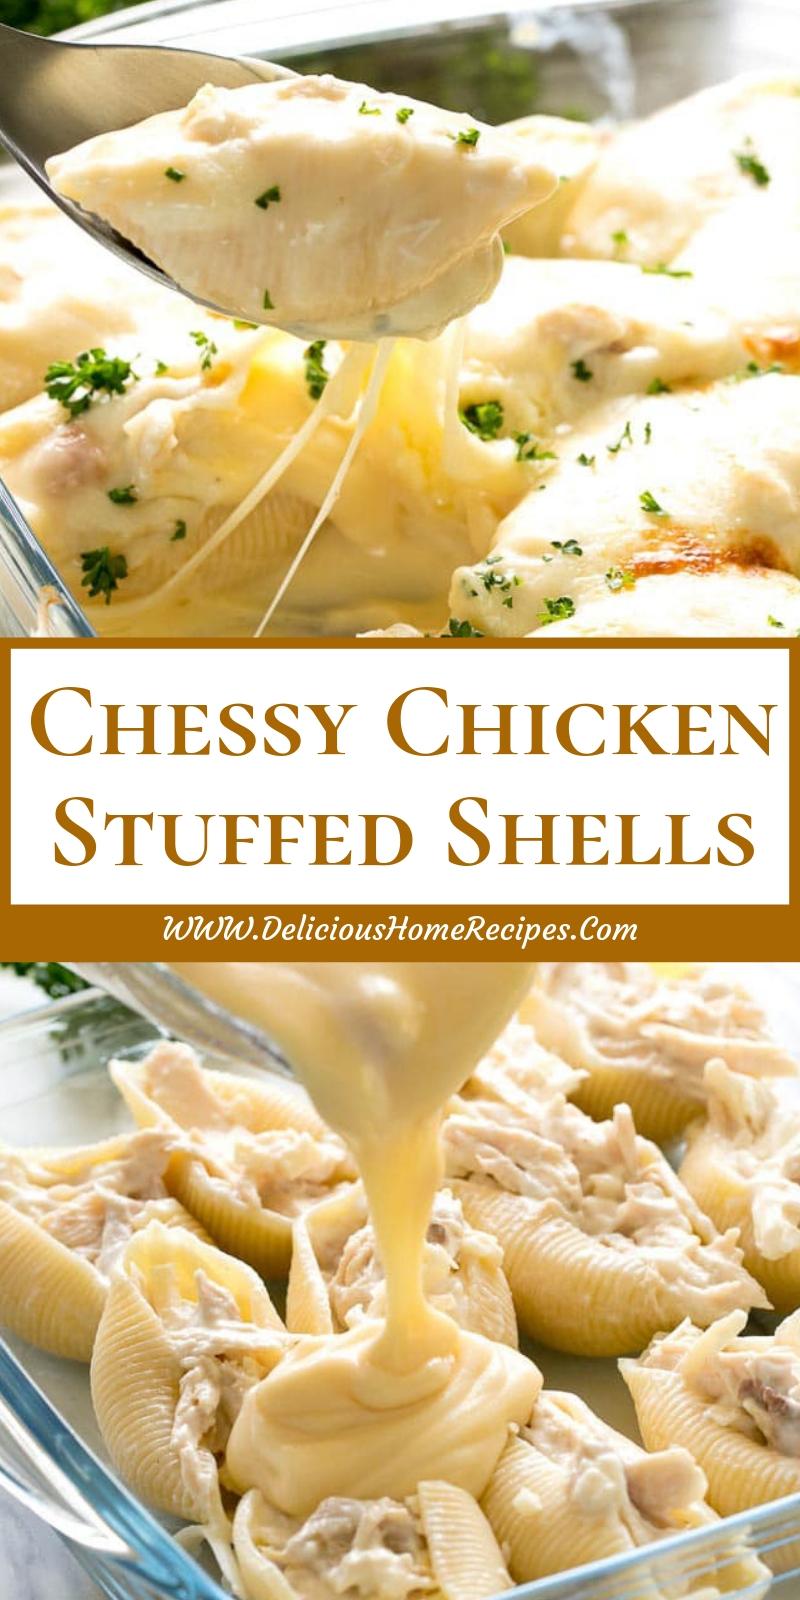 Chessy Chicken Stuffed Shells